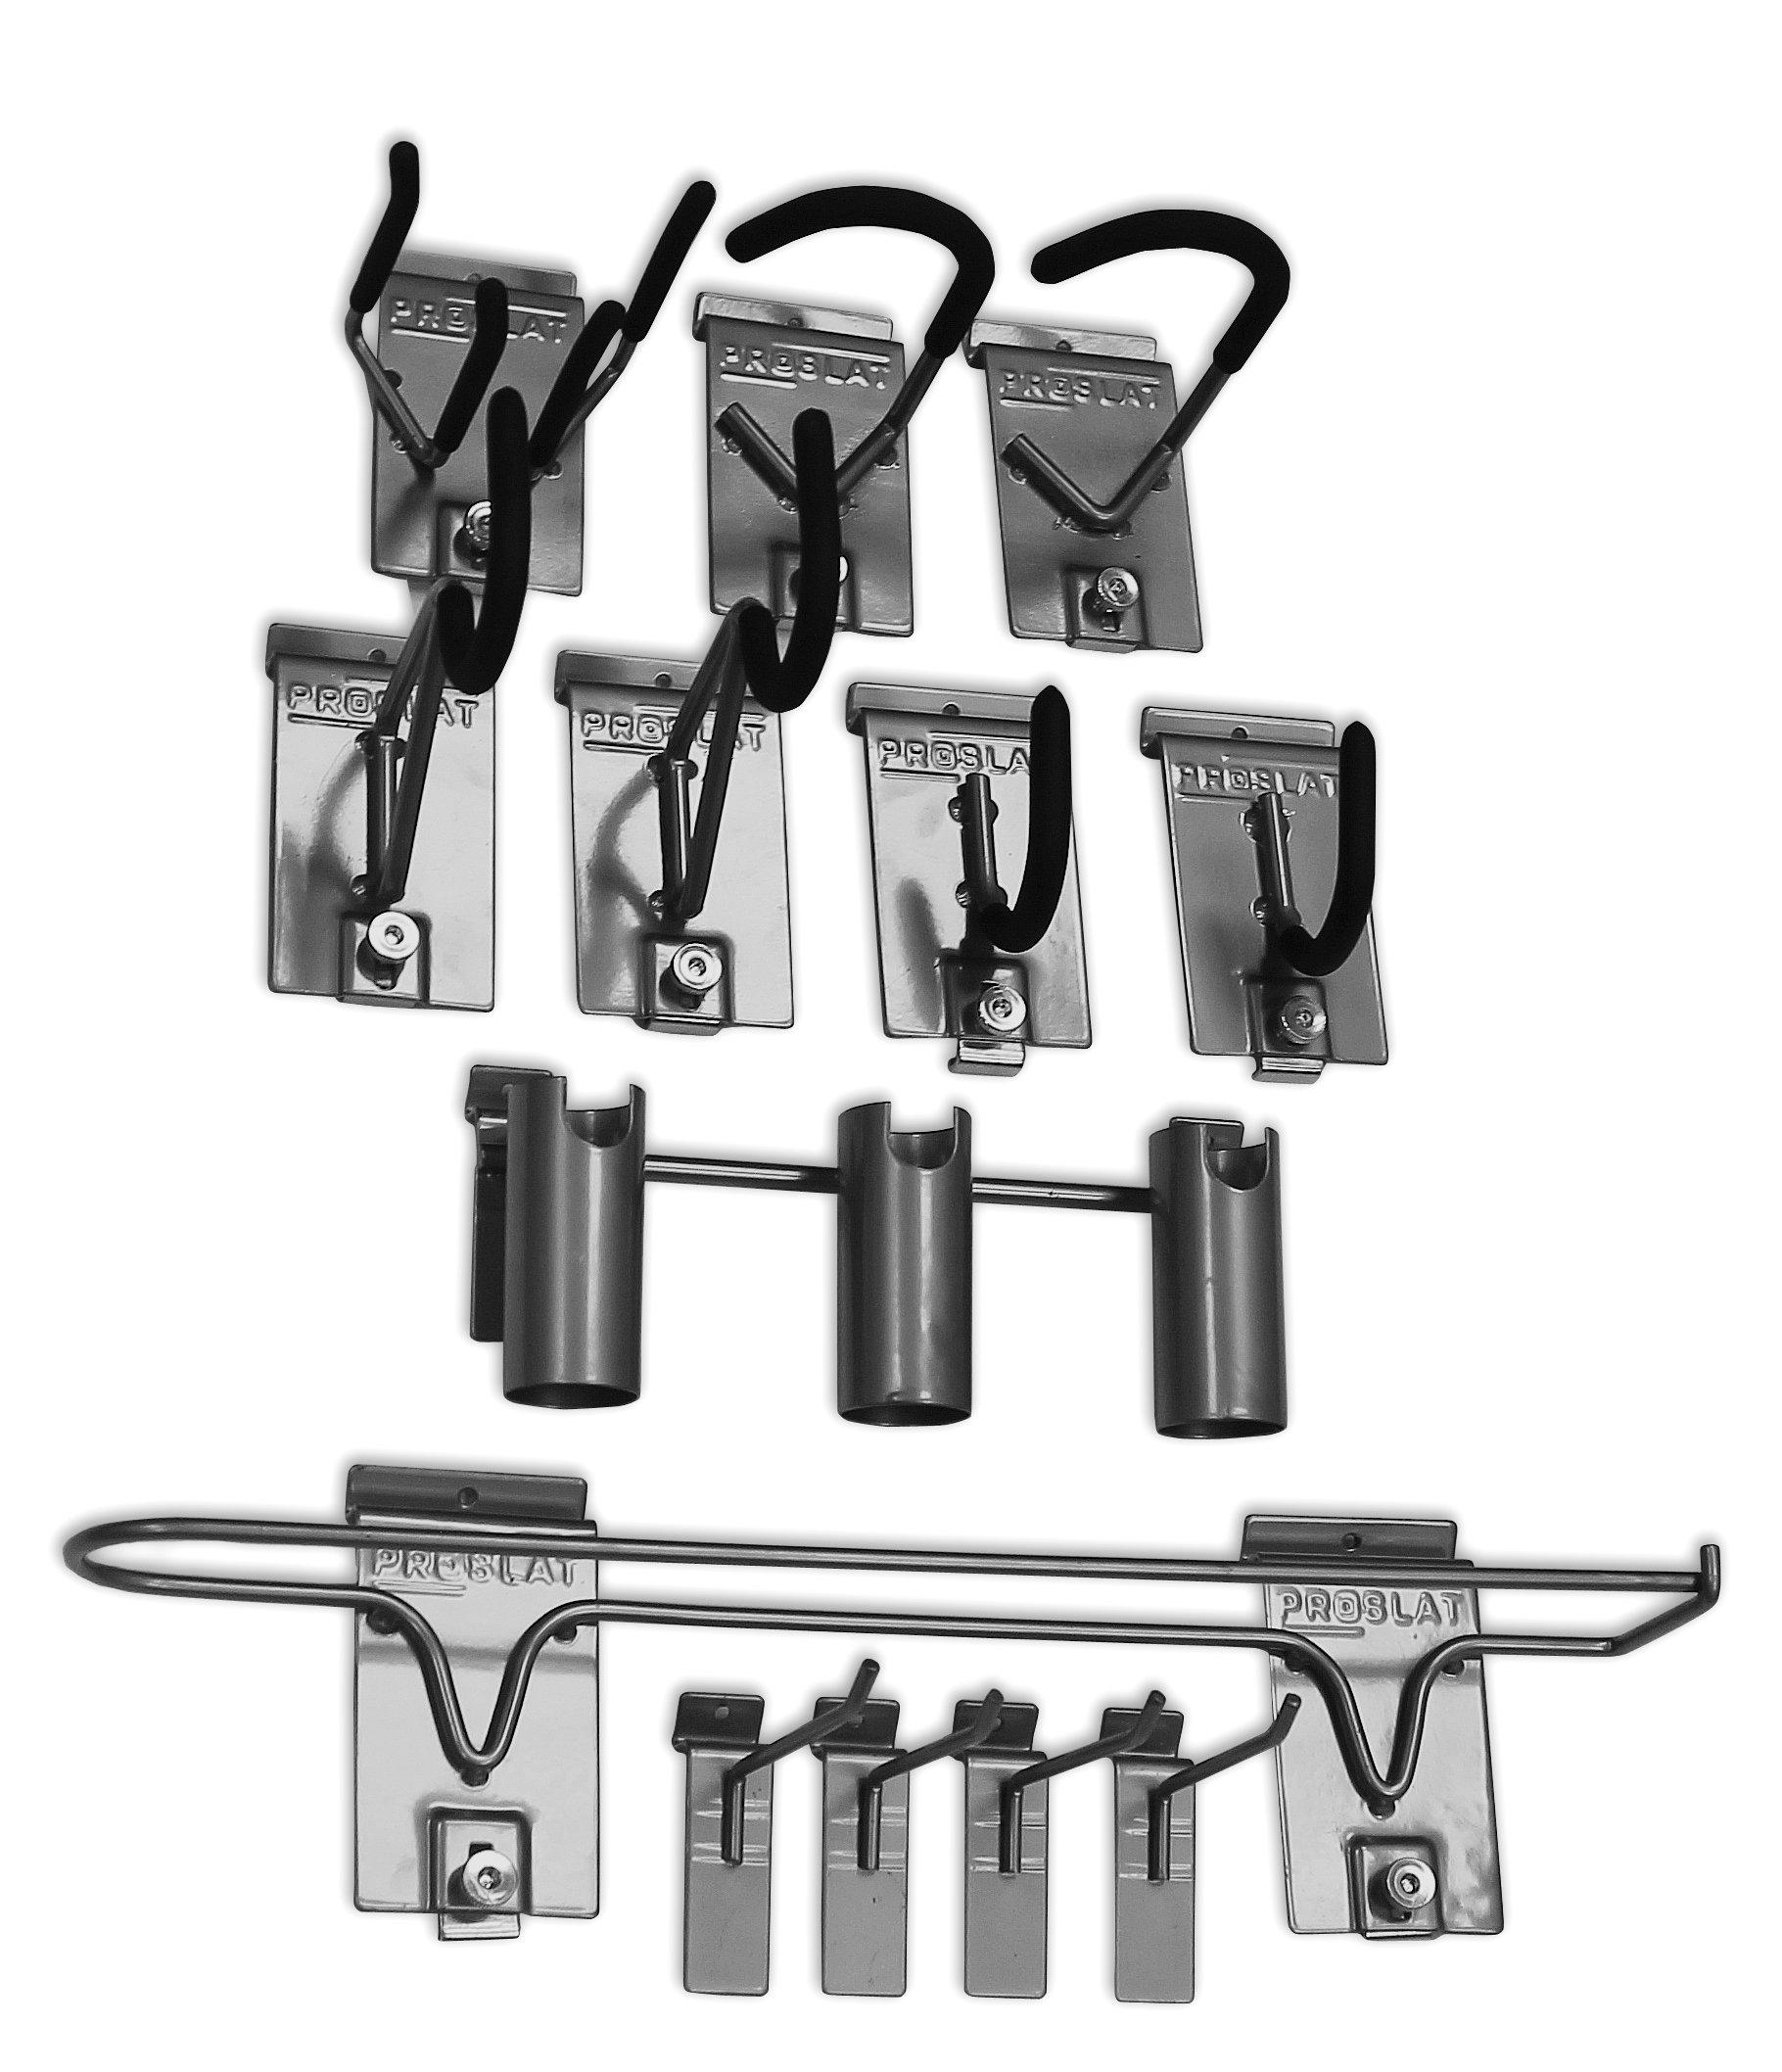 Proslat 11005 Sports Equipment Steel Hook Variety Kit Designed for Proslat PVC Slatwall, 13-Piece by Proslat